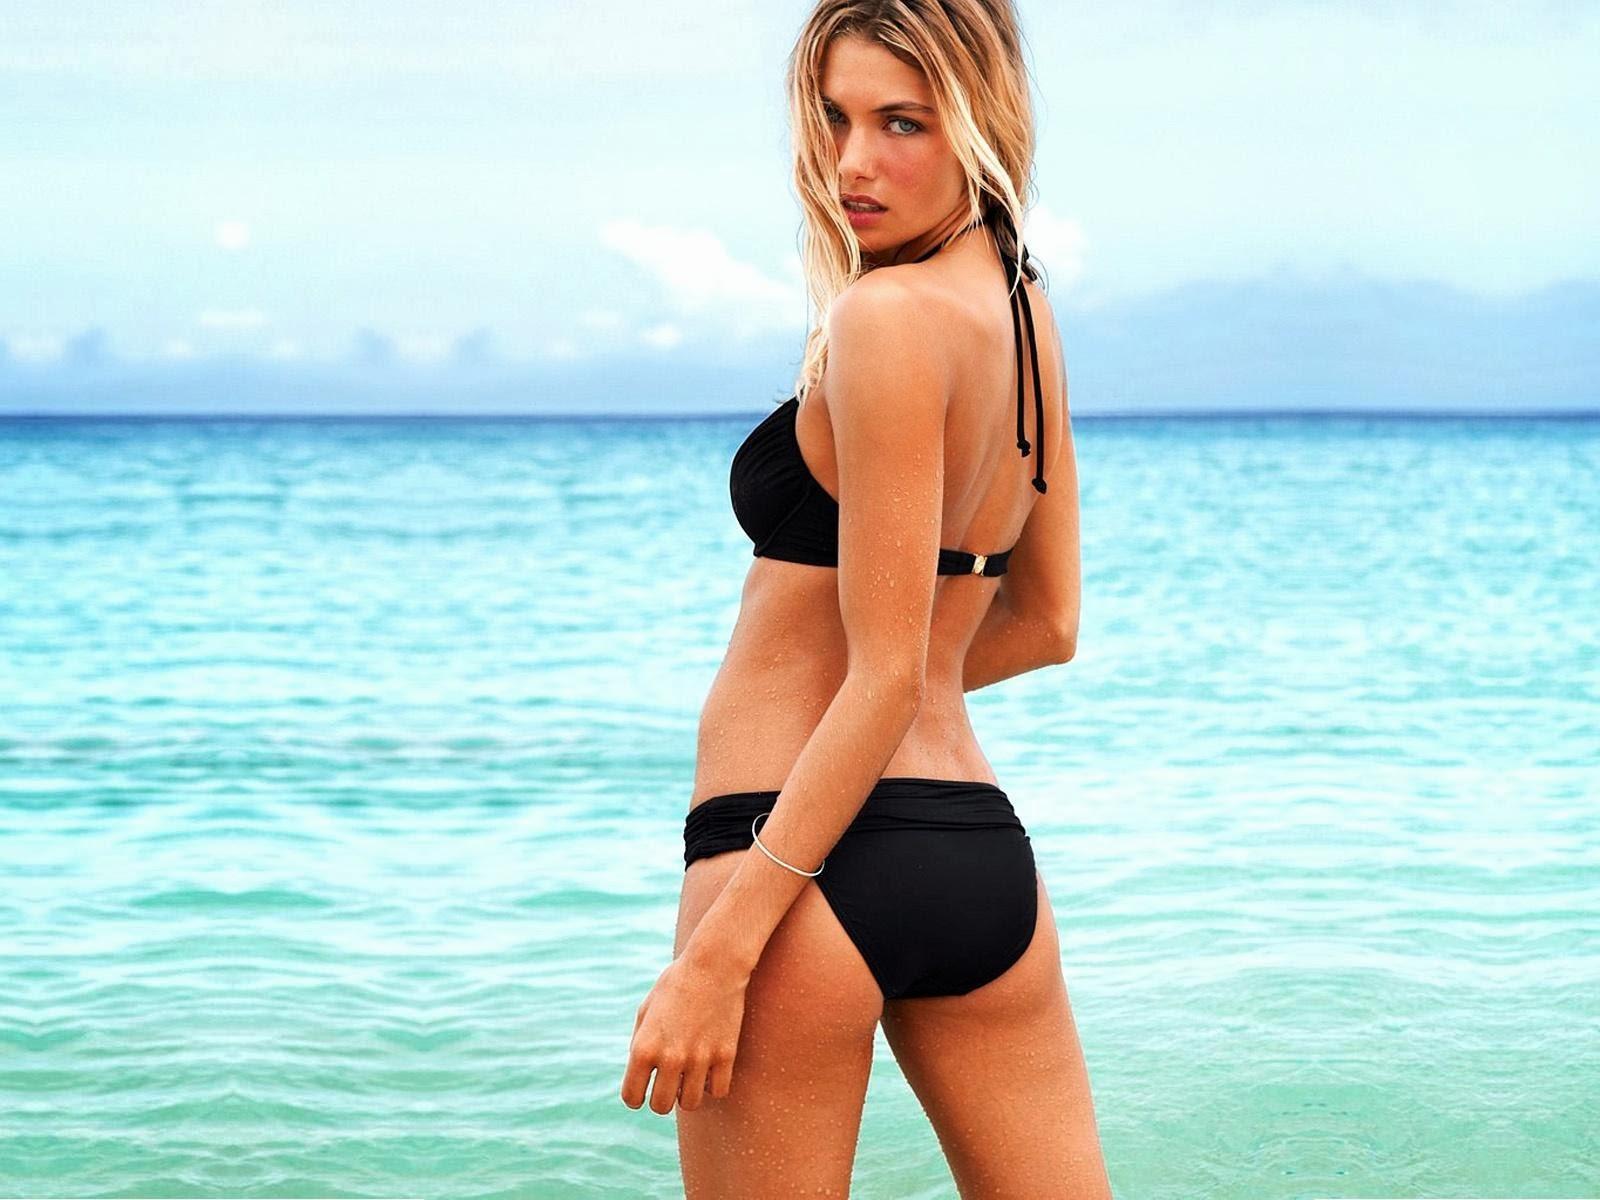 Hot Model Jessica Hart